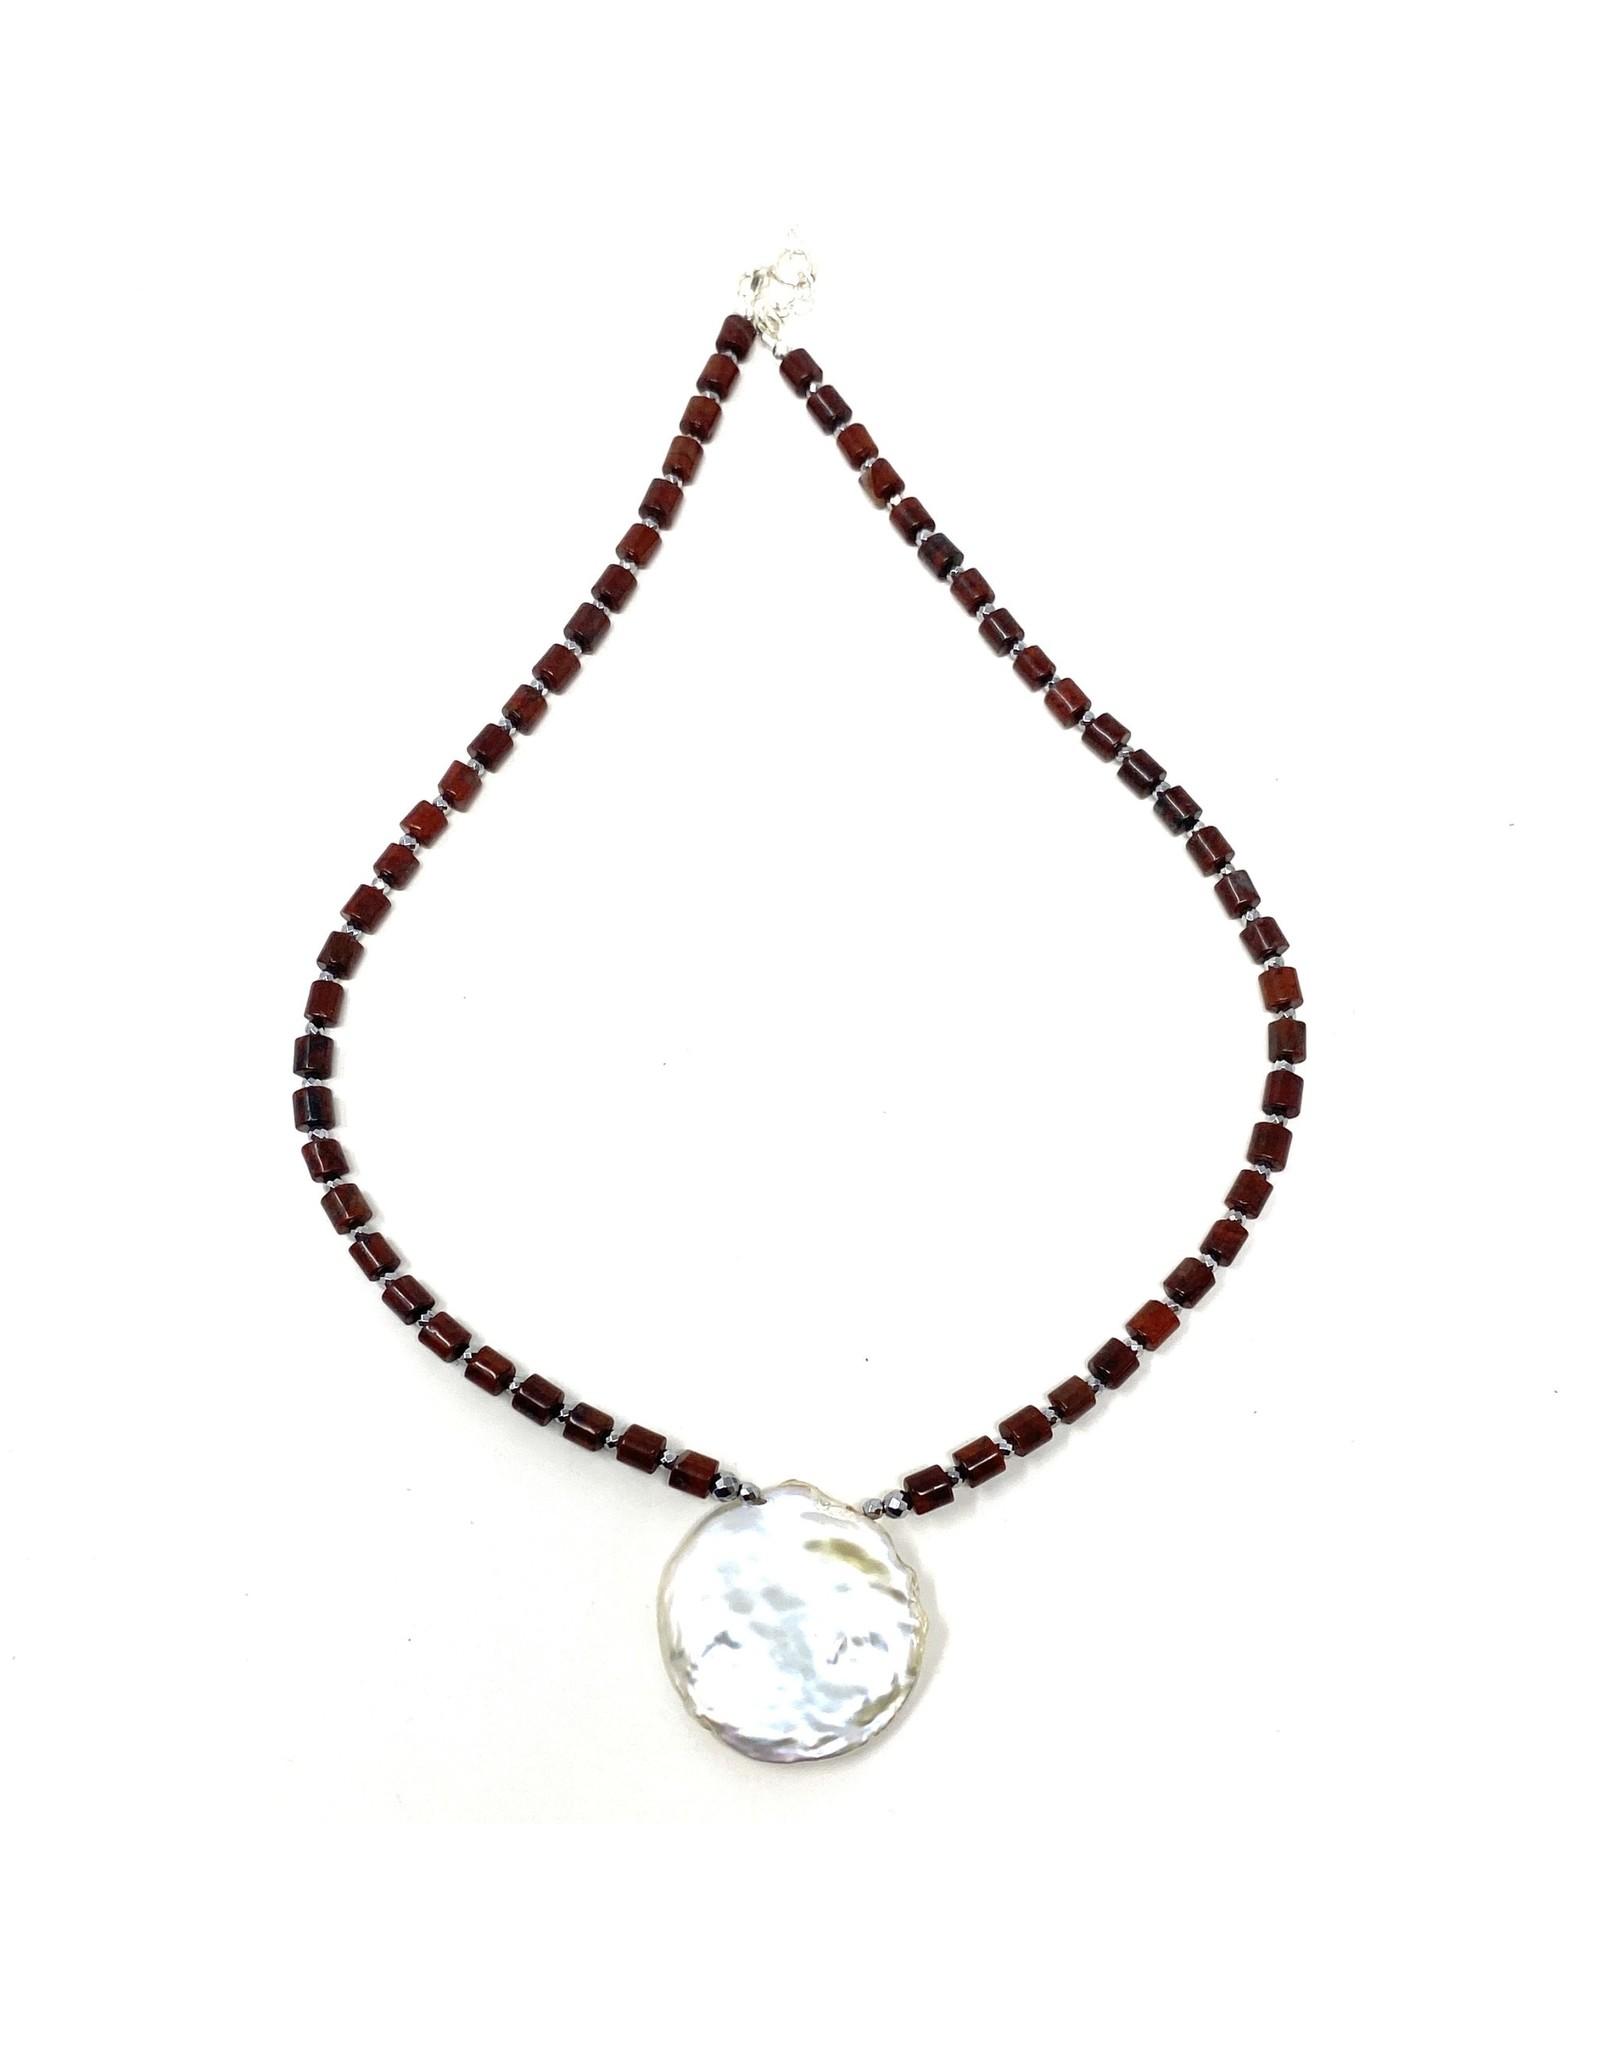 Round Keshi Pearl & Brec. Jasper Necklace